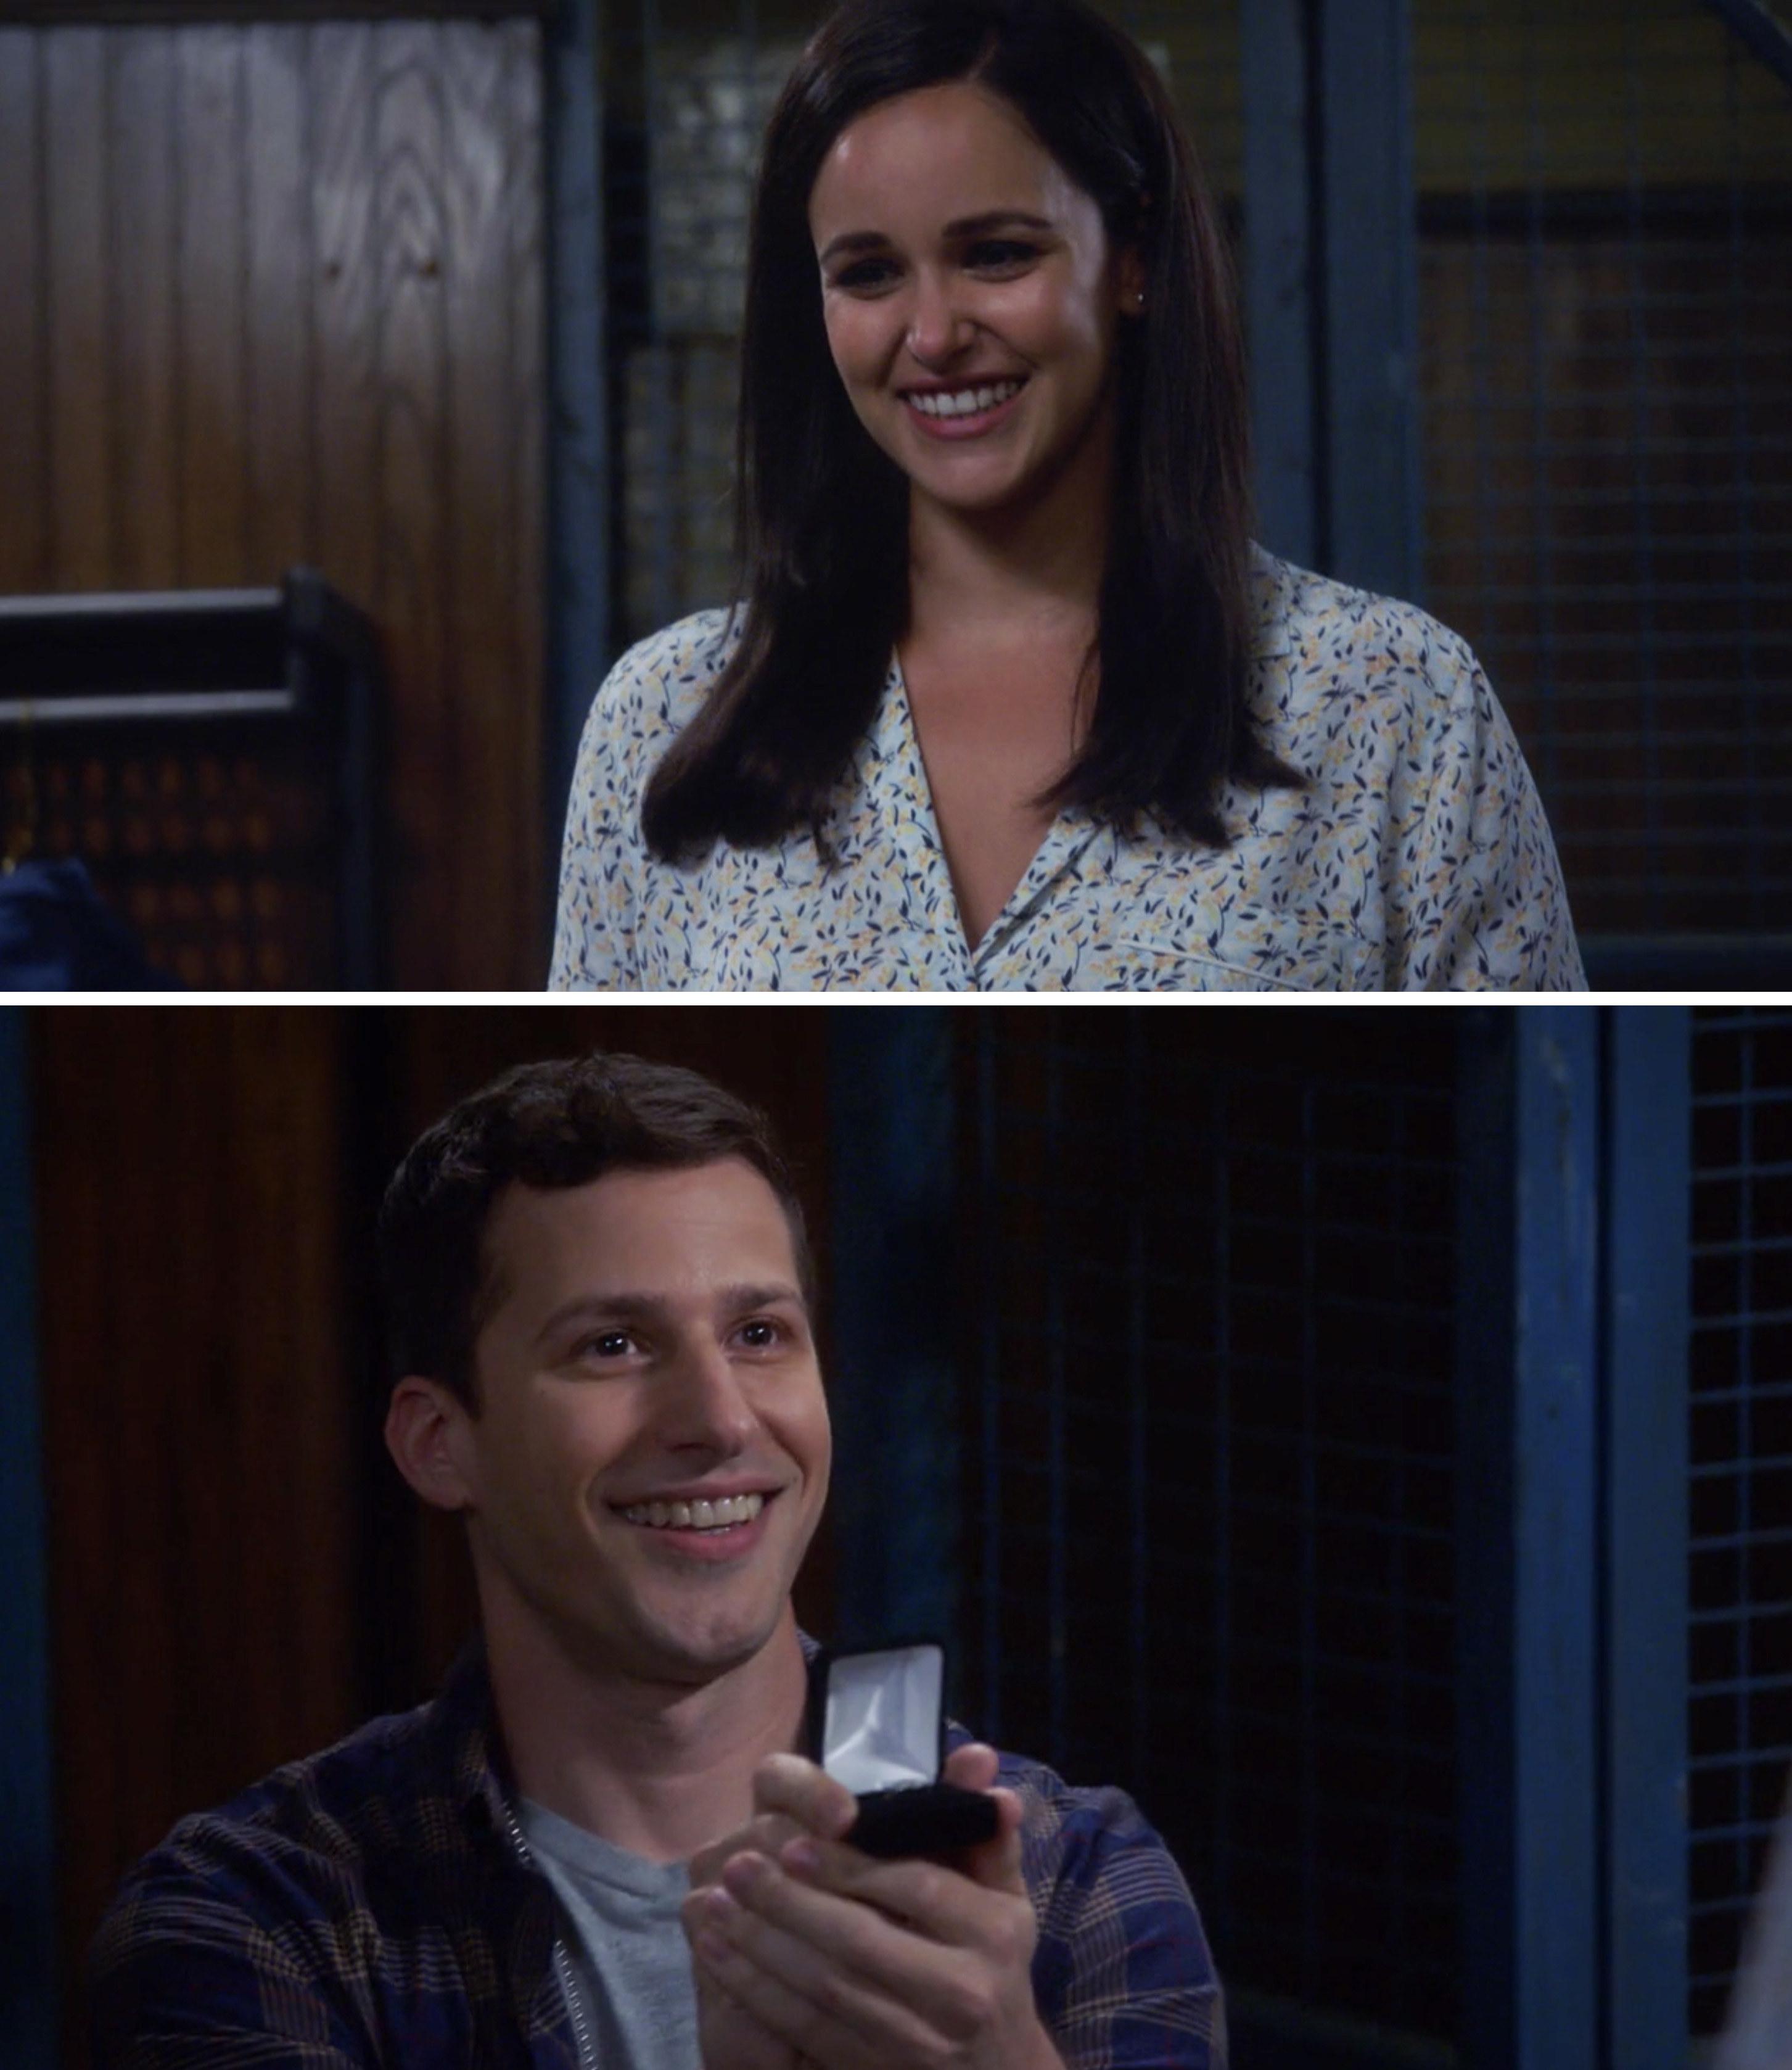 Jake proposing to Amy